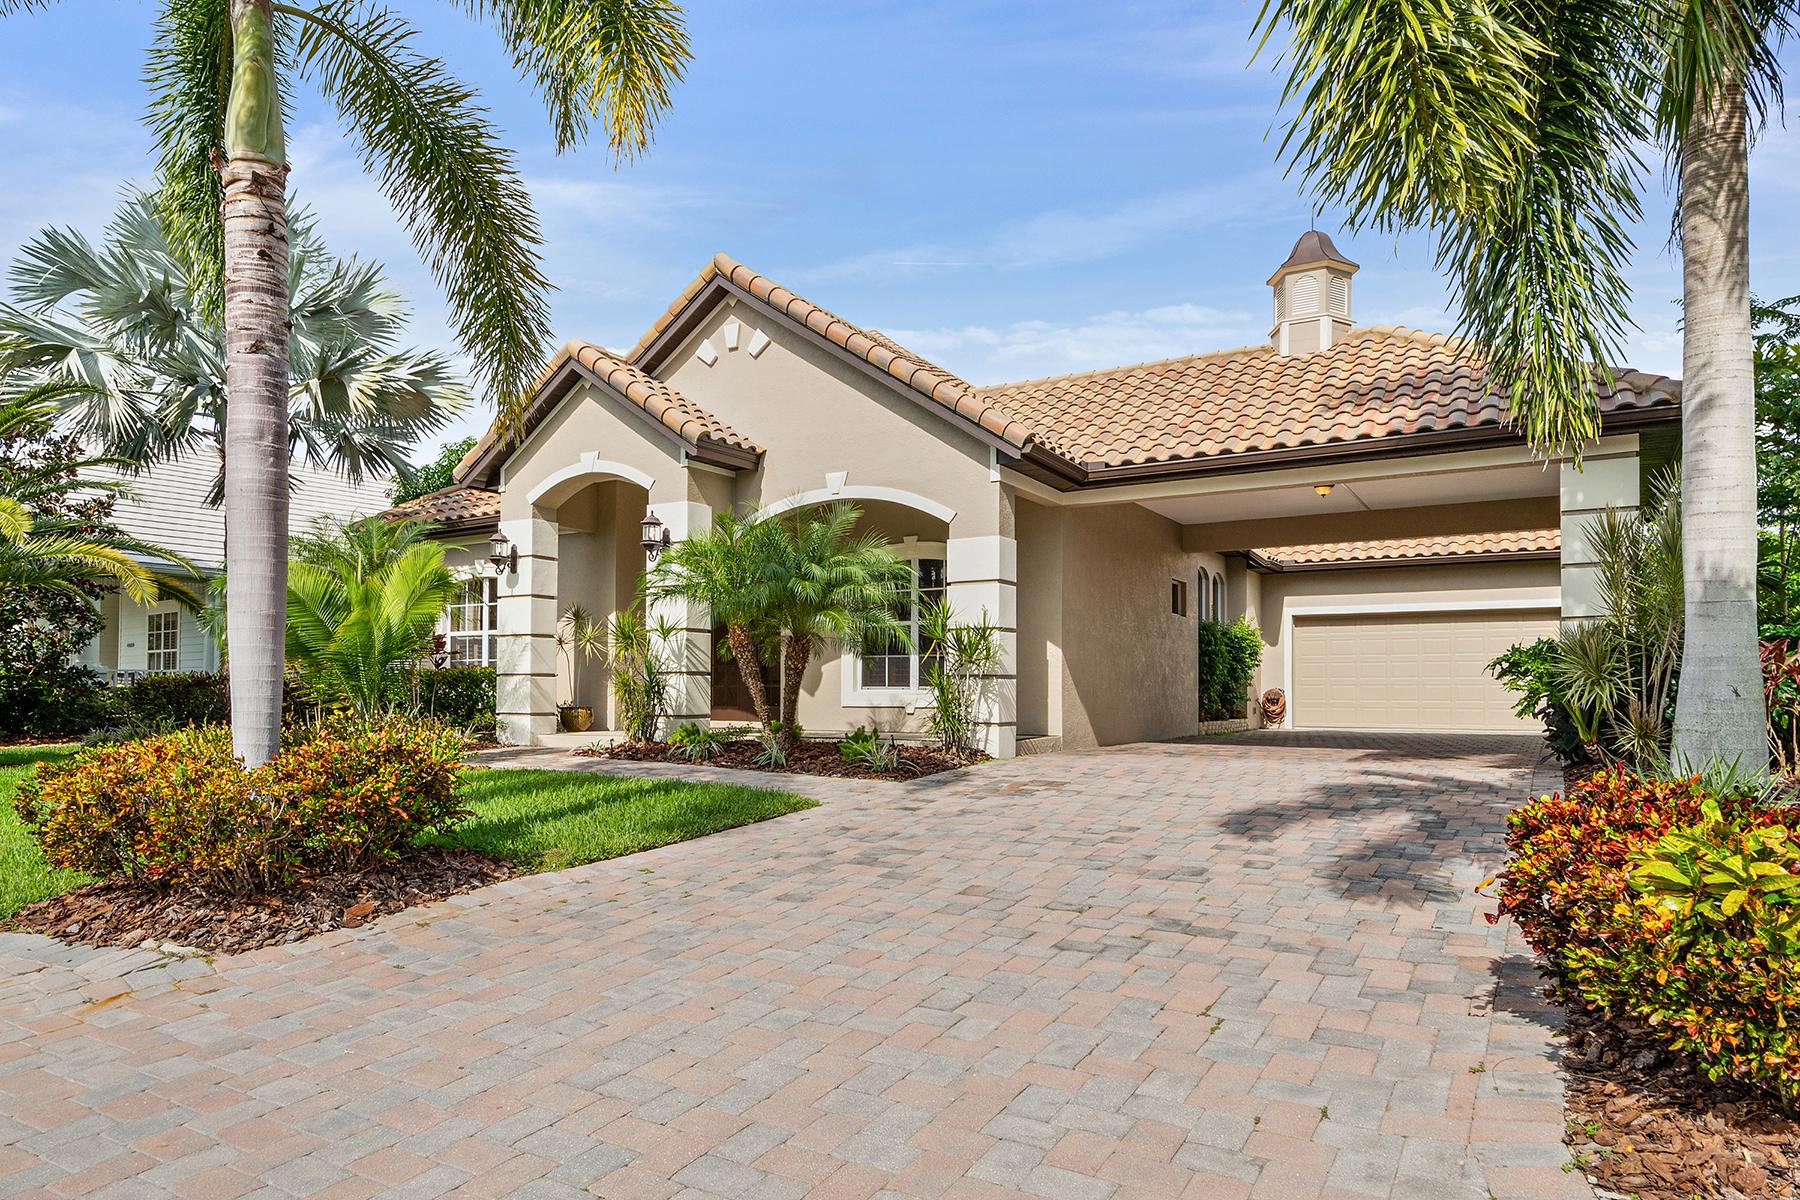 Single Family Homes のために 売買 アット HABROUR WALK RIVERDALE REV 4713 Mainsail Dr Bradenton, フロリダ 34208 アメリカ